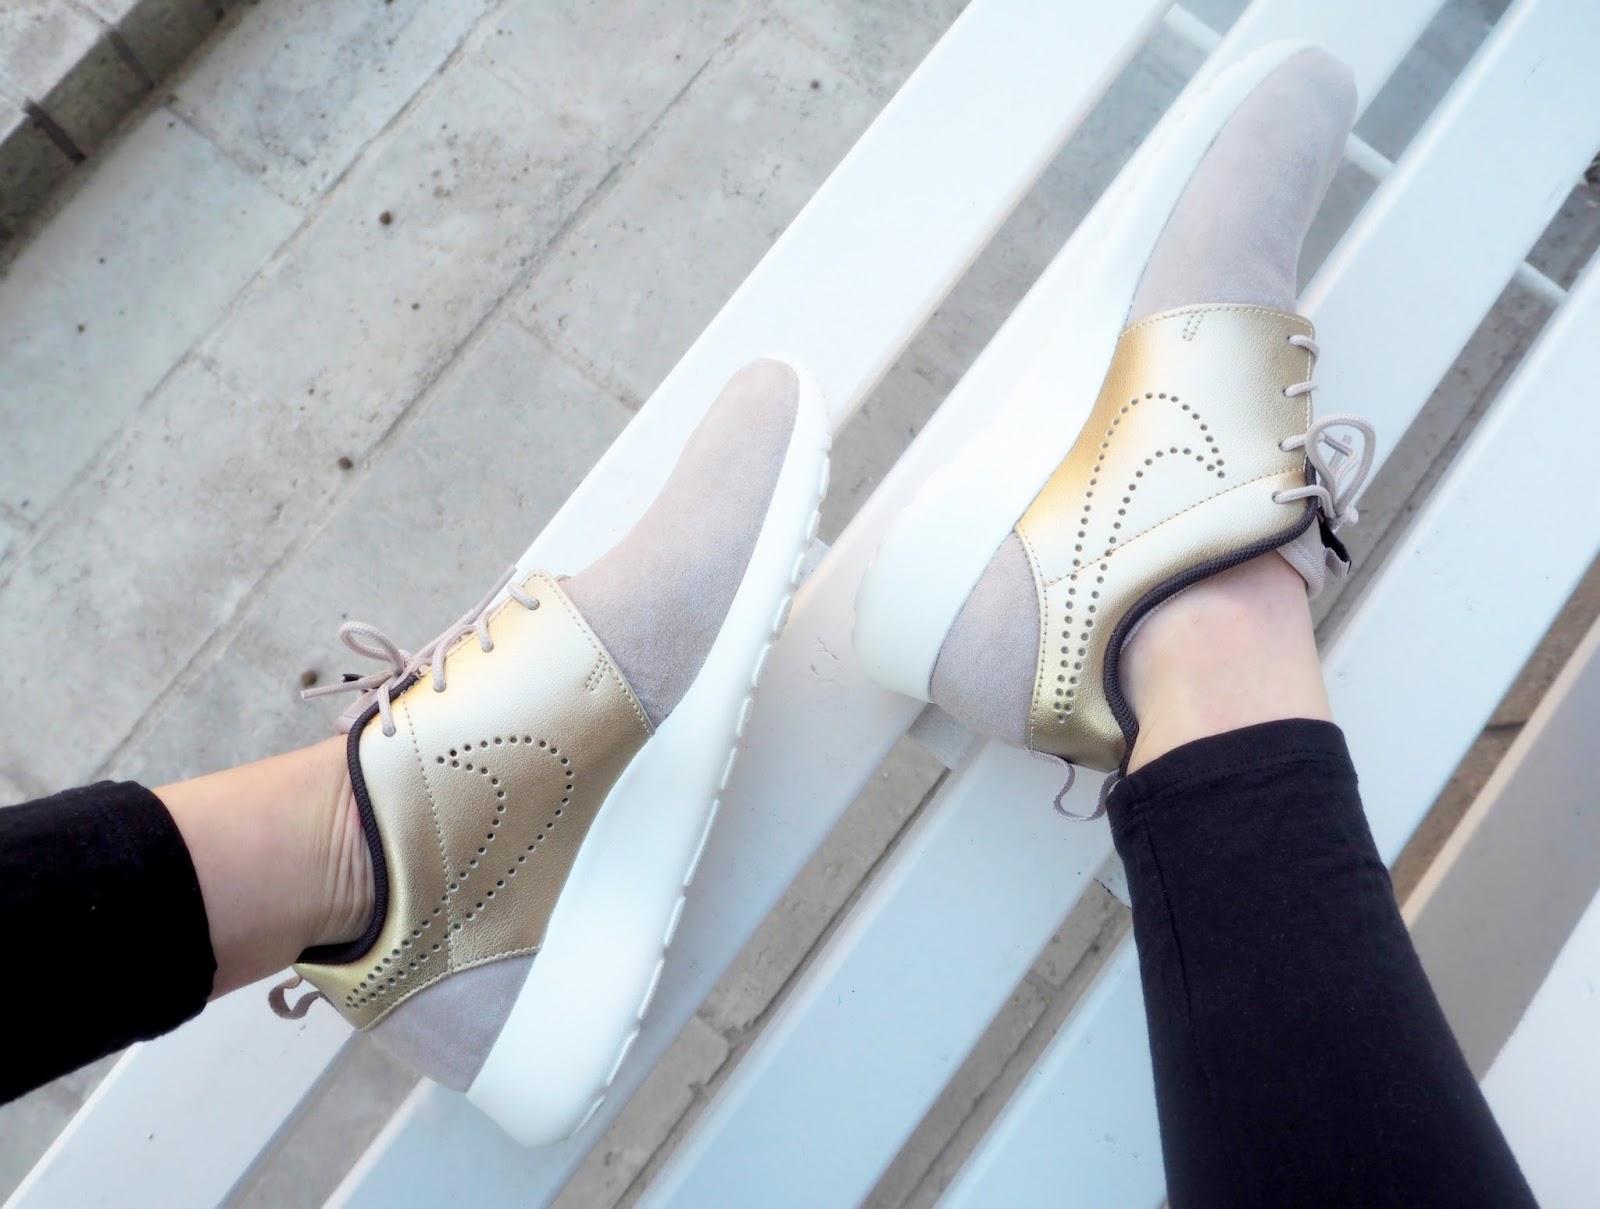 nike rose one blog tenisky gold sneakers eBay freshlabels zoot answear